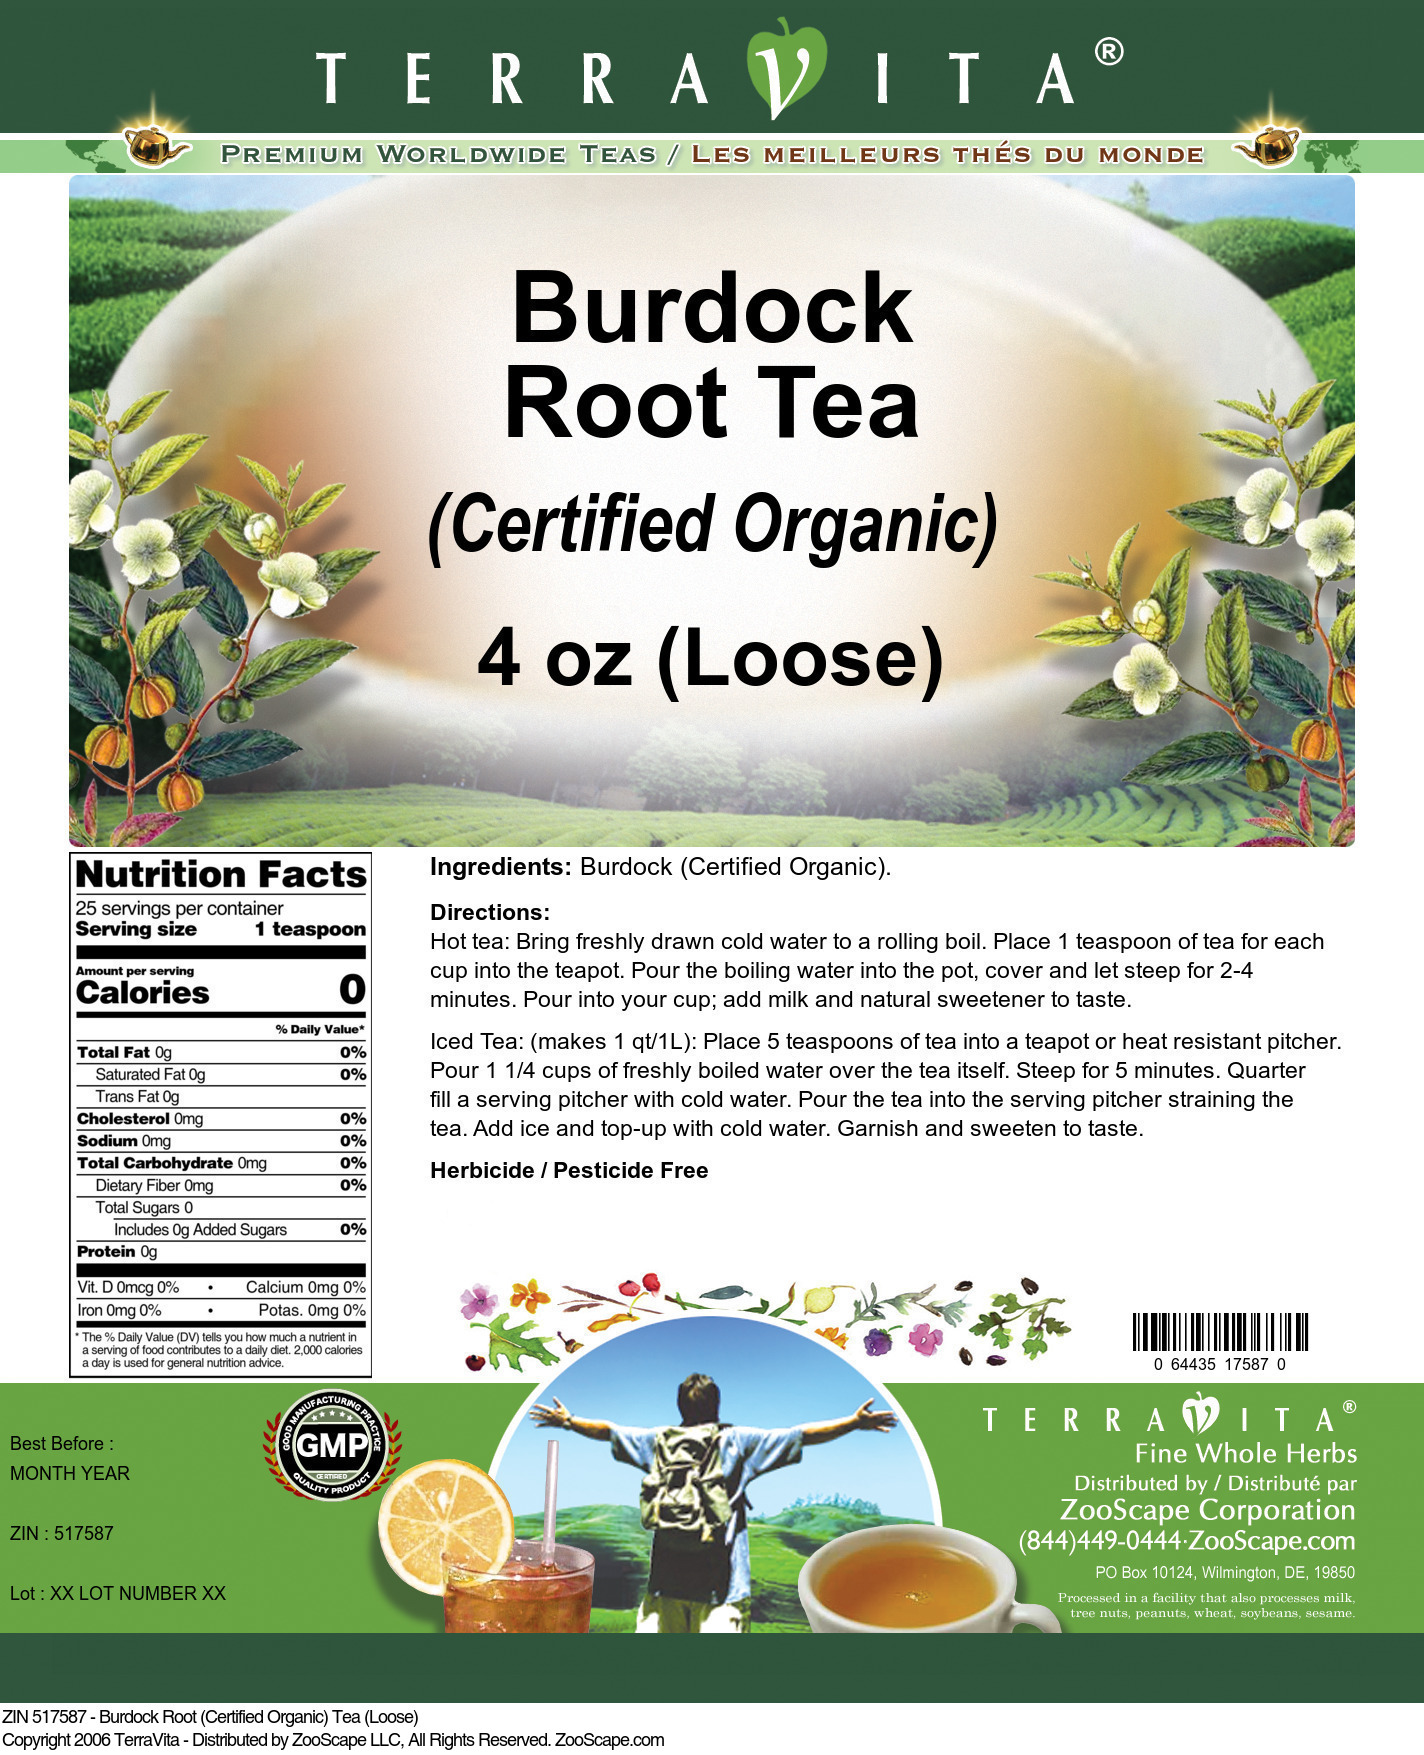 Burdock Root (Certified Organic) Tea (Loose)